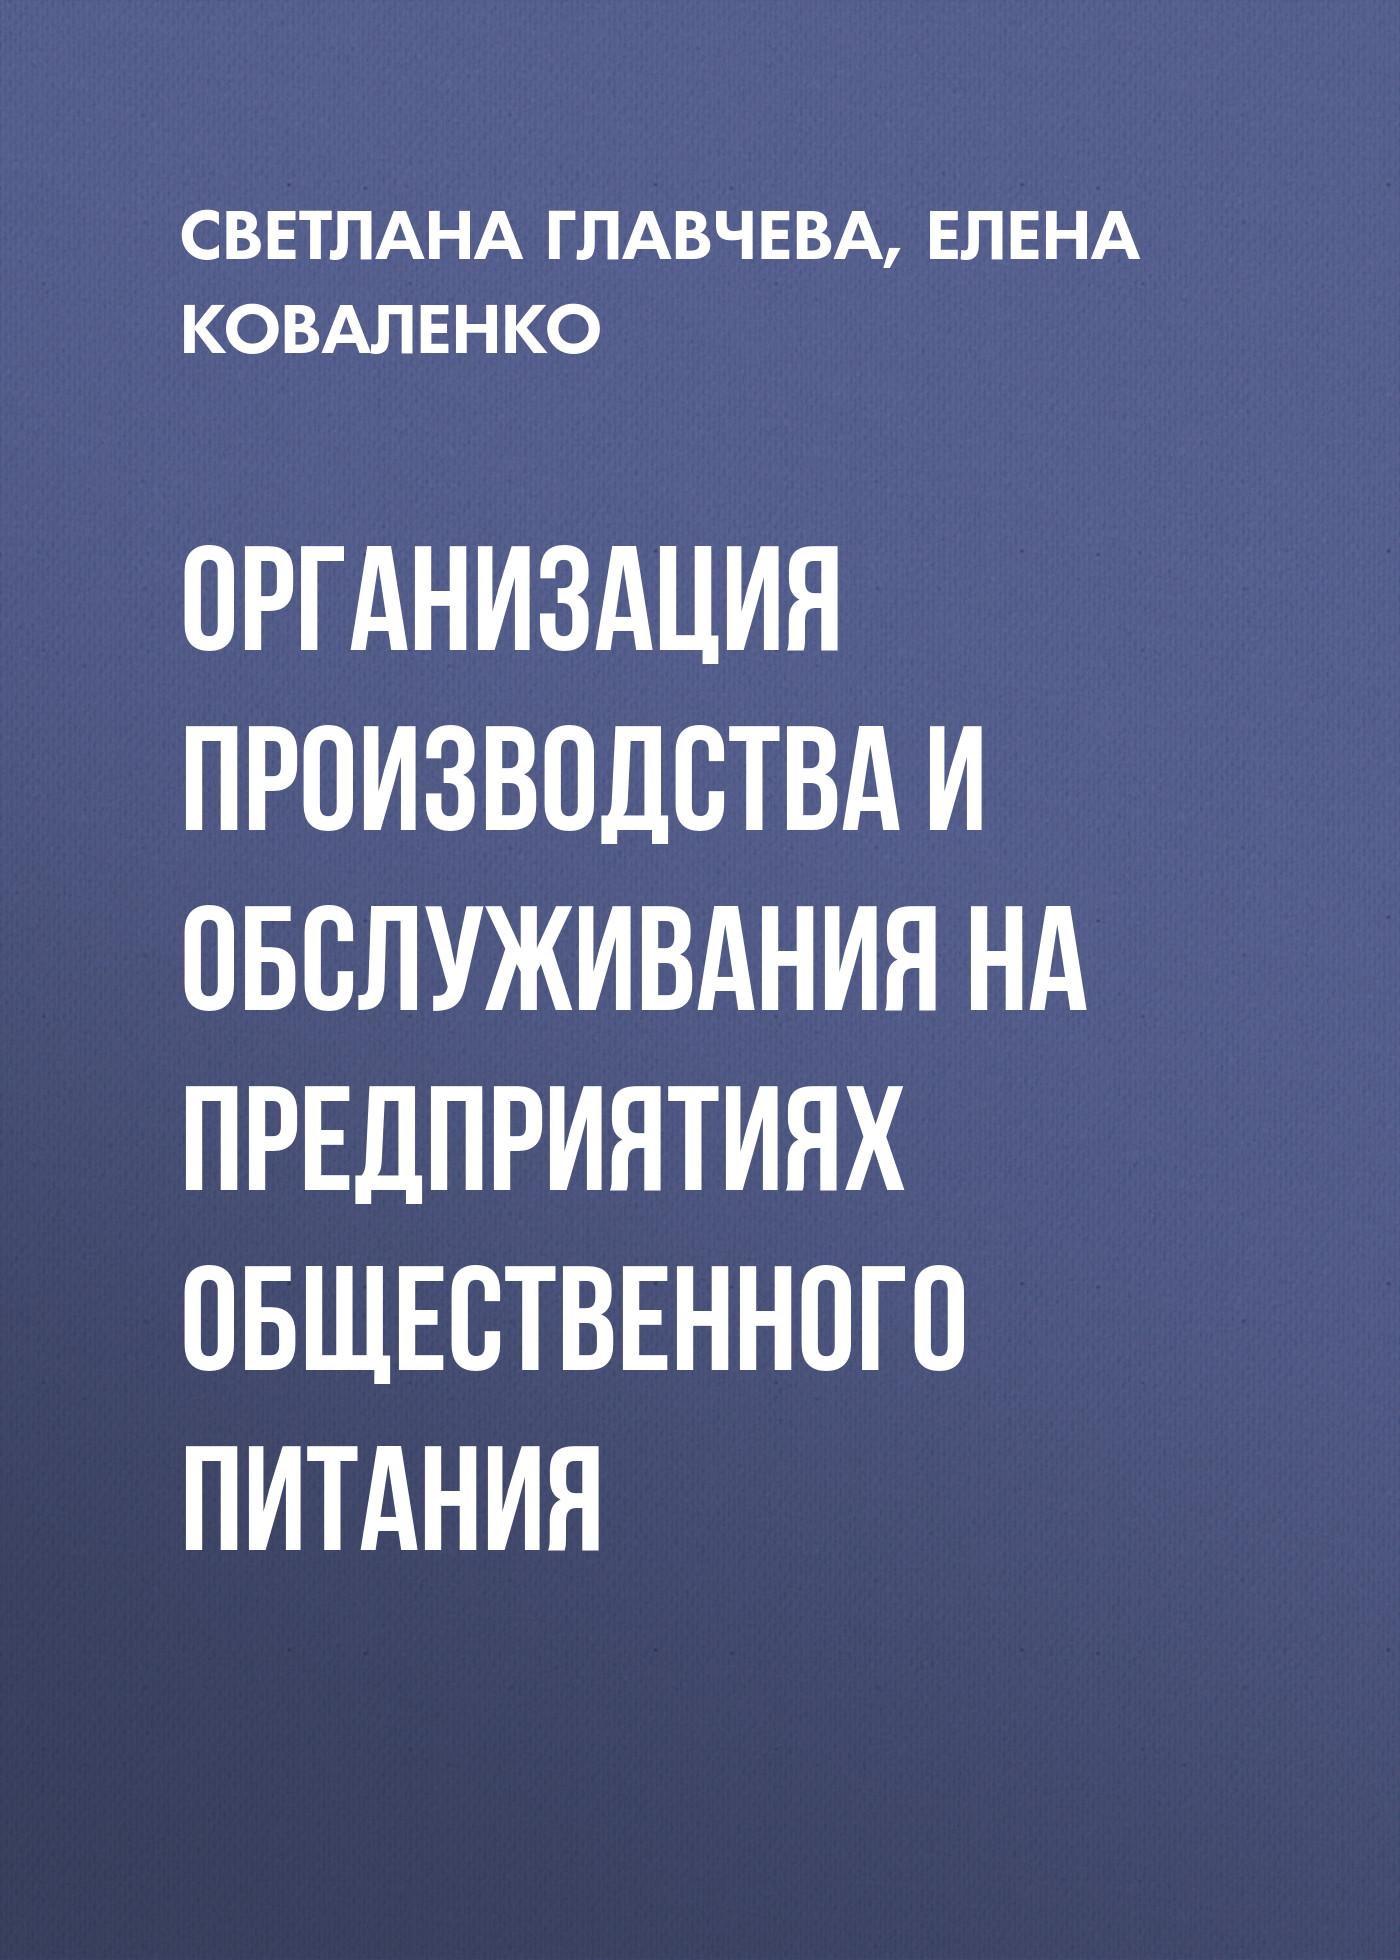 Елена Коваленко Организация производства и обслуживания на предприятиях общественного питания связь на промышленных предприятиях